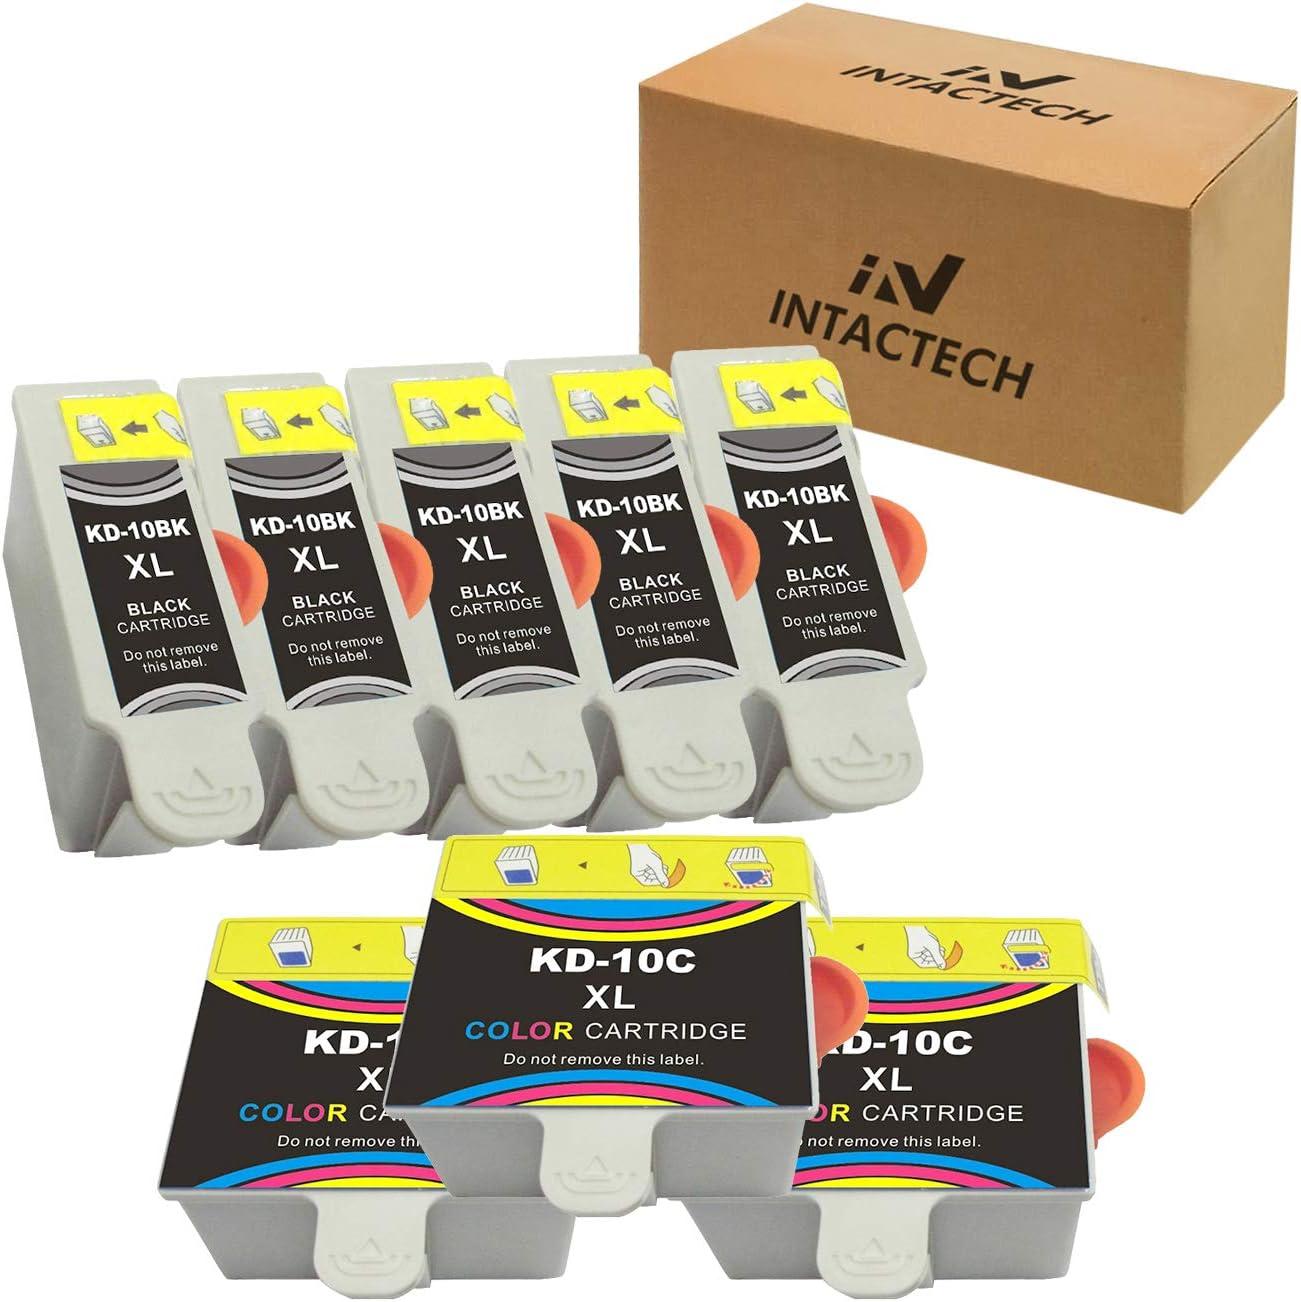 Intactech Compatible with Kodak 10XL 10B 10C ESP 3250 Ink Cartridges 8 Combo (5 Black, 3 Color) Work for Kodak ESP 3, ESP 3250, 5250, 9250, Office 6150, EASYSHARE 5500, Hero 7.1, 9.1, 6.1 Printer